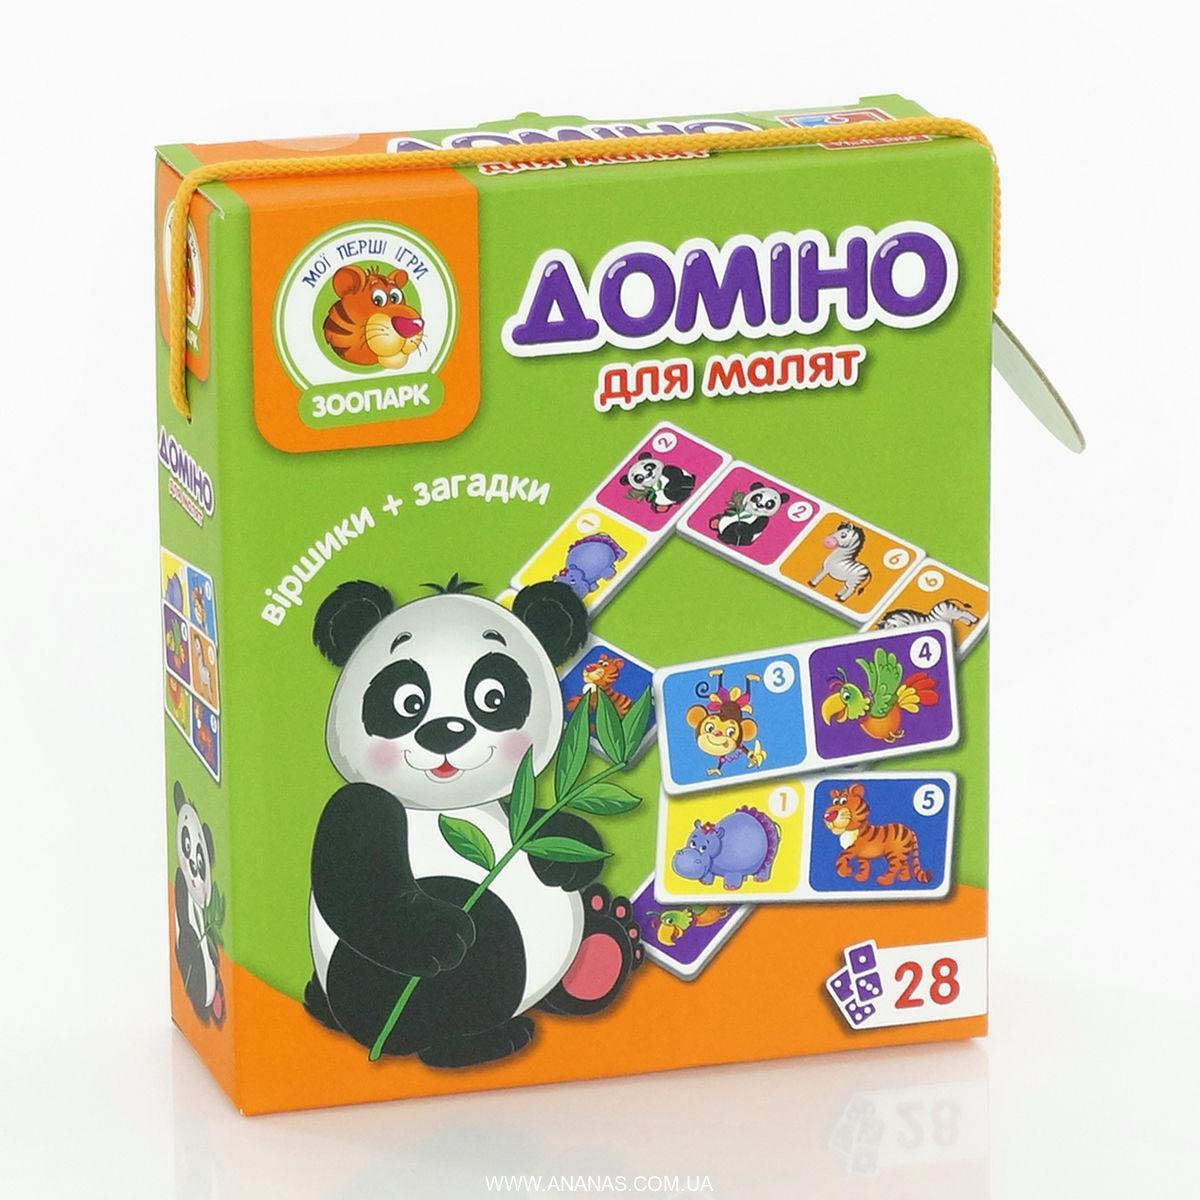 Доміно для малят Зоопарк арт. VT 2100-02 (укр.)